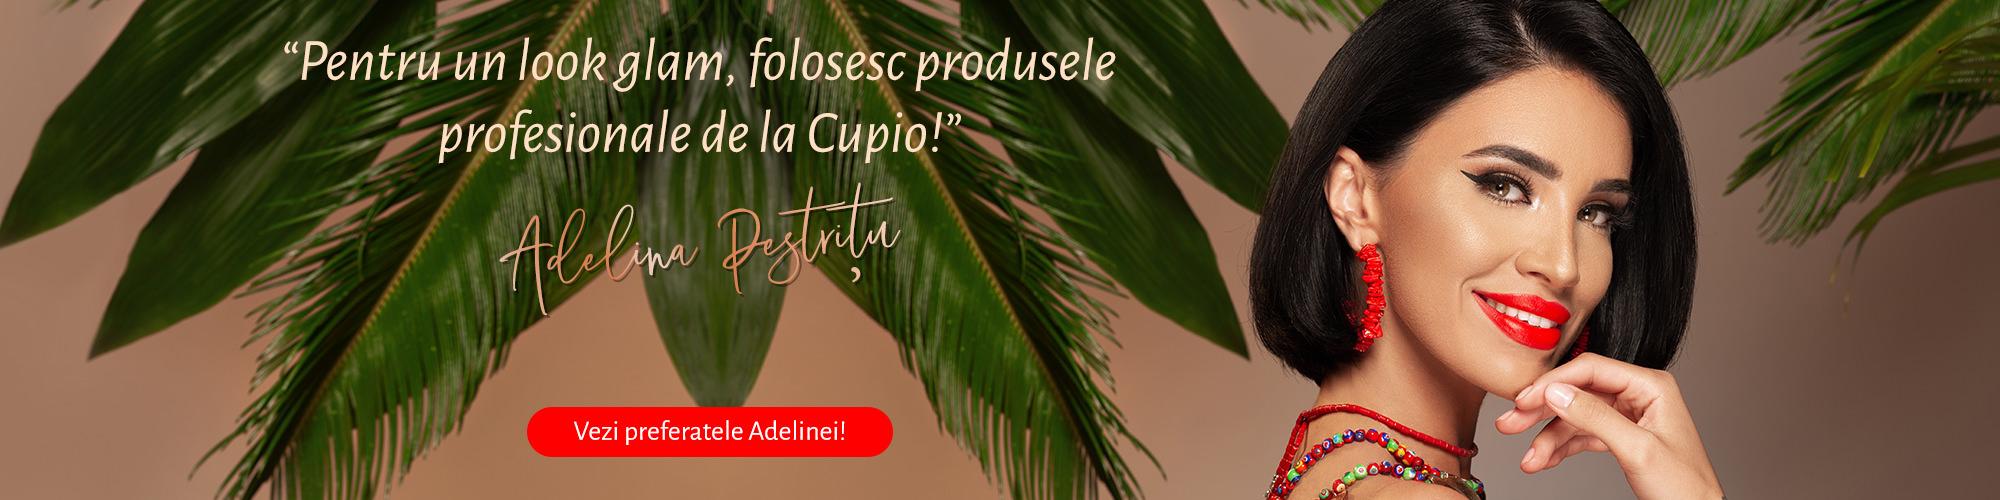 cupio-img